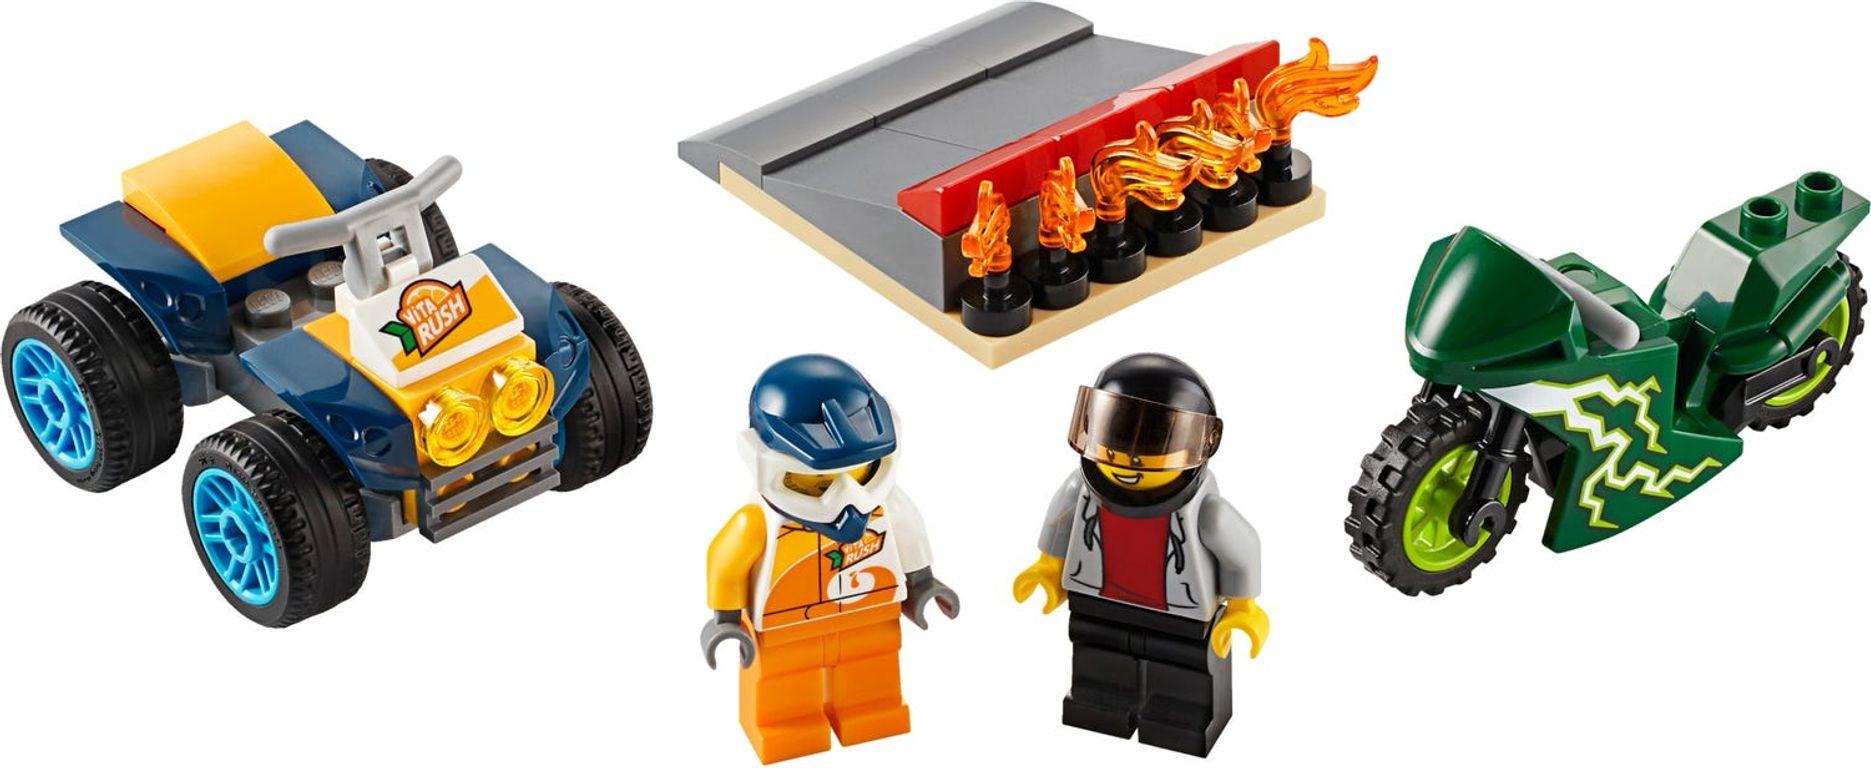 Stunt Team components